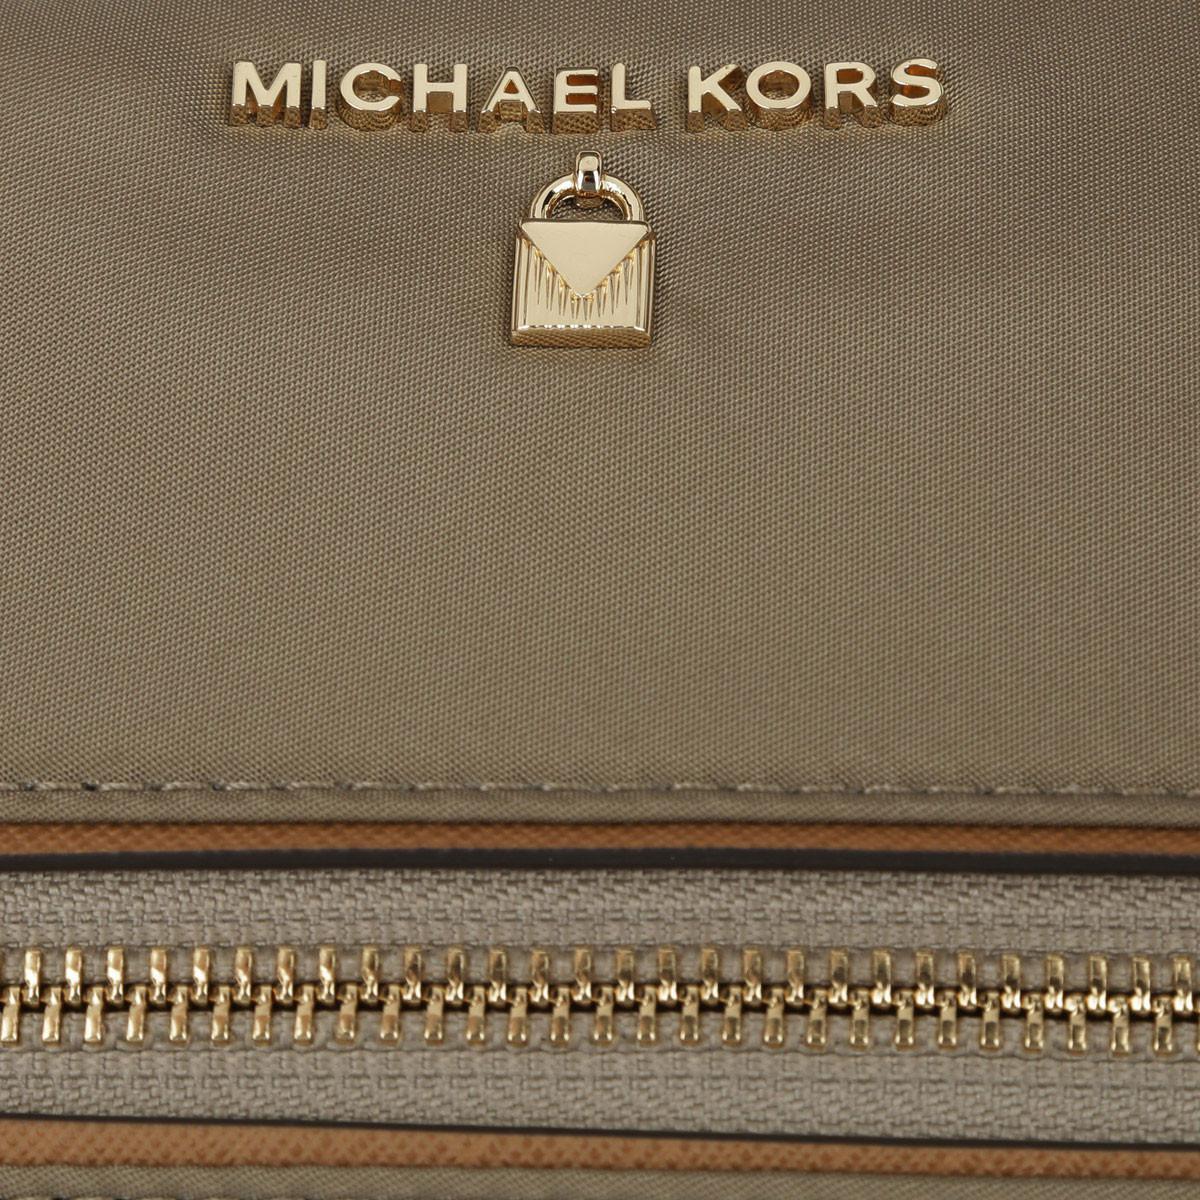 Michael Kors Synthetic Nylon Kelsey Md Tz Tote Dusk in Brown